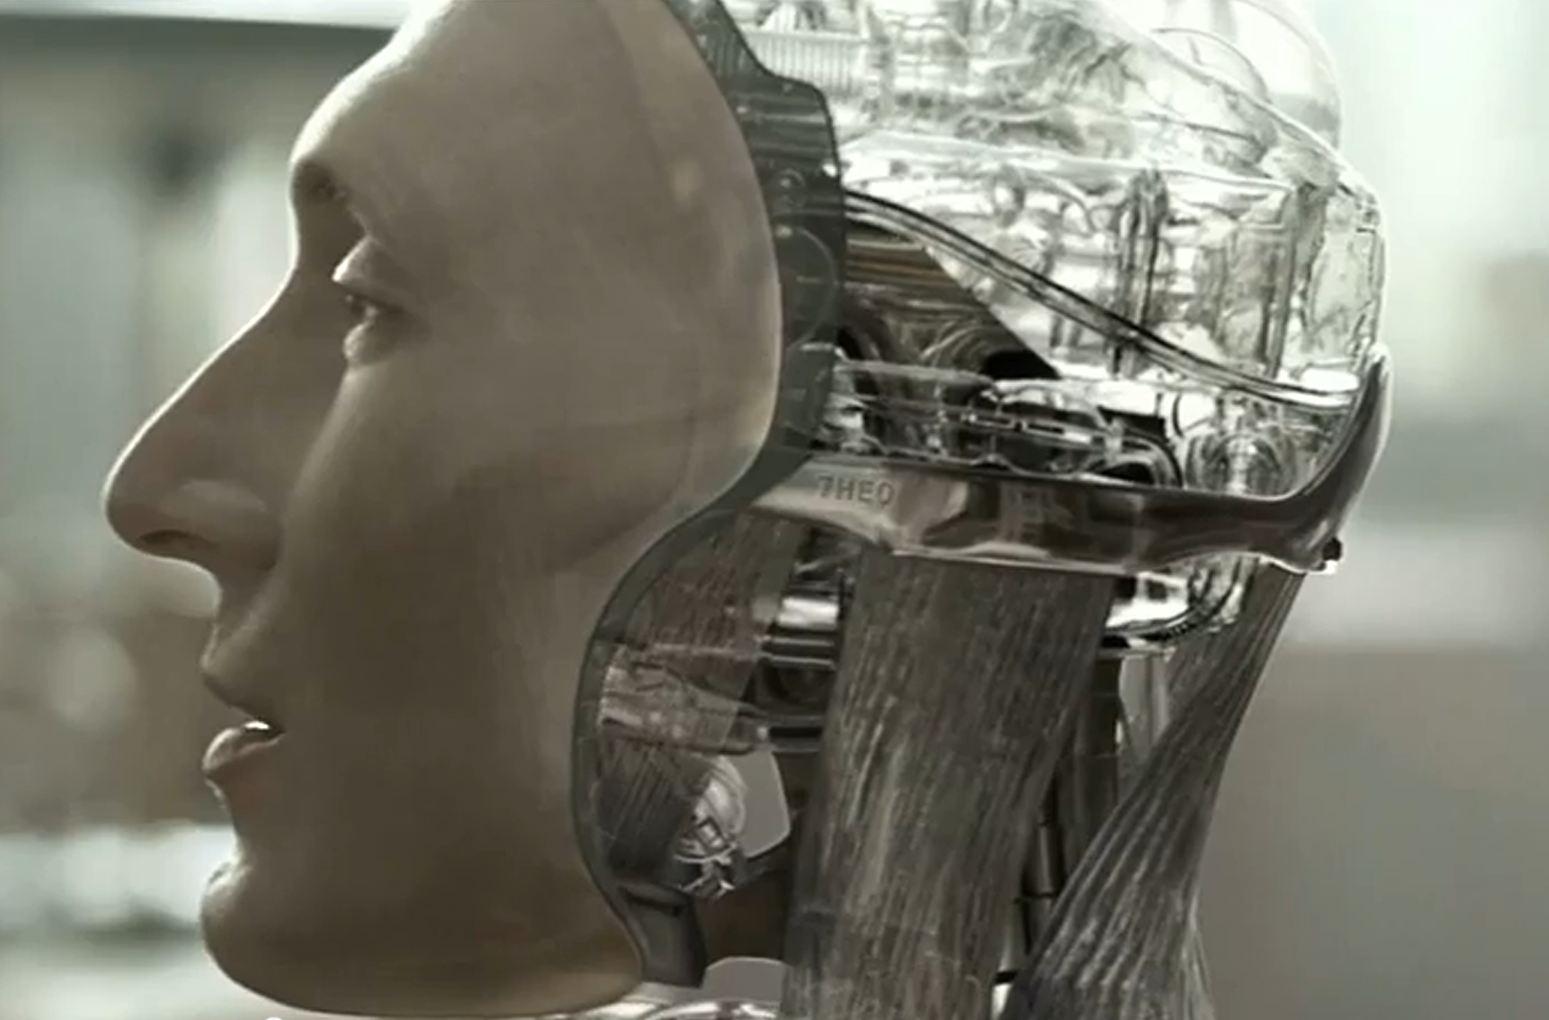 Domesro Immortal Domestic Robots